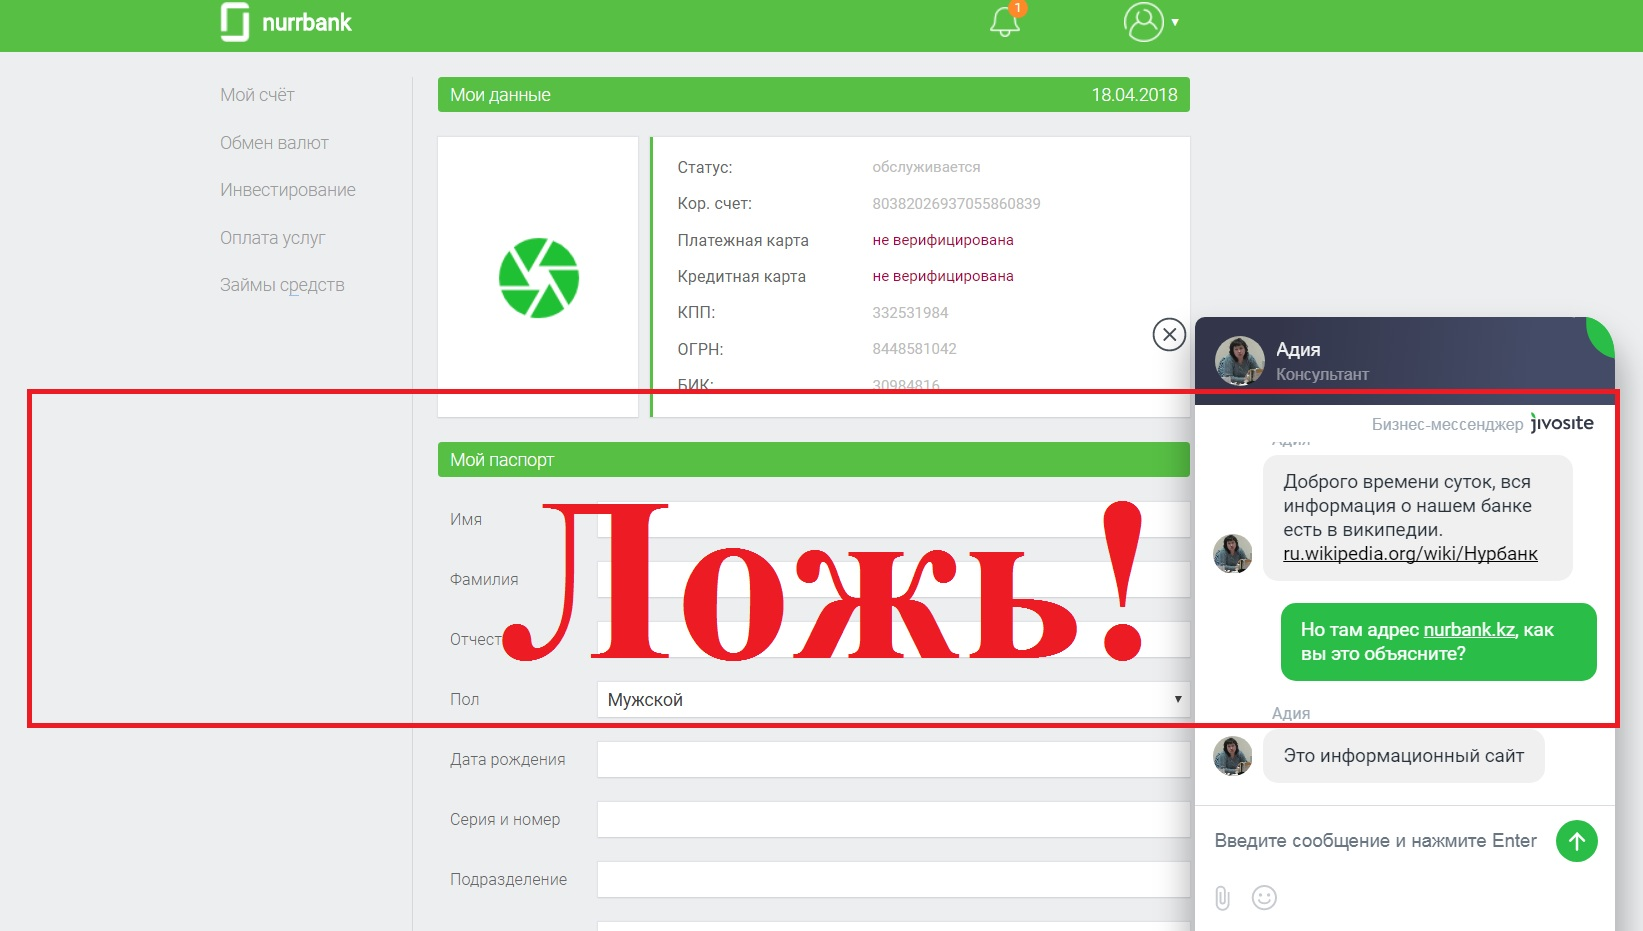 Nurrbank – 1й банк Казахстана https://nurrbank.kz